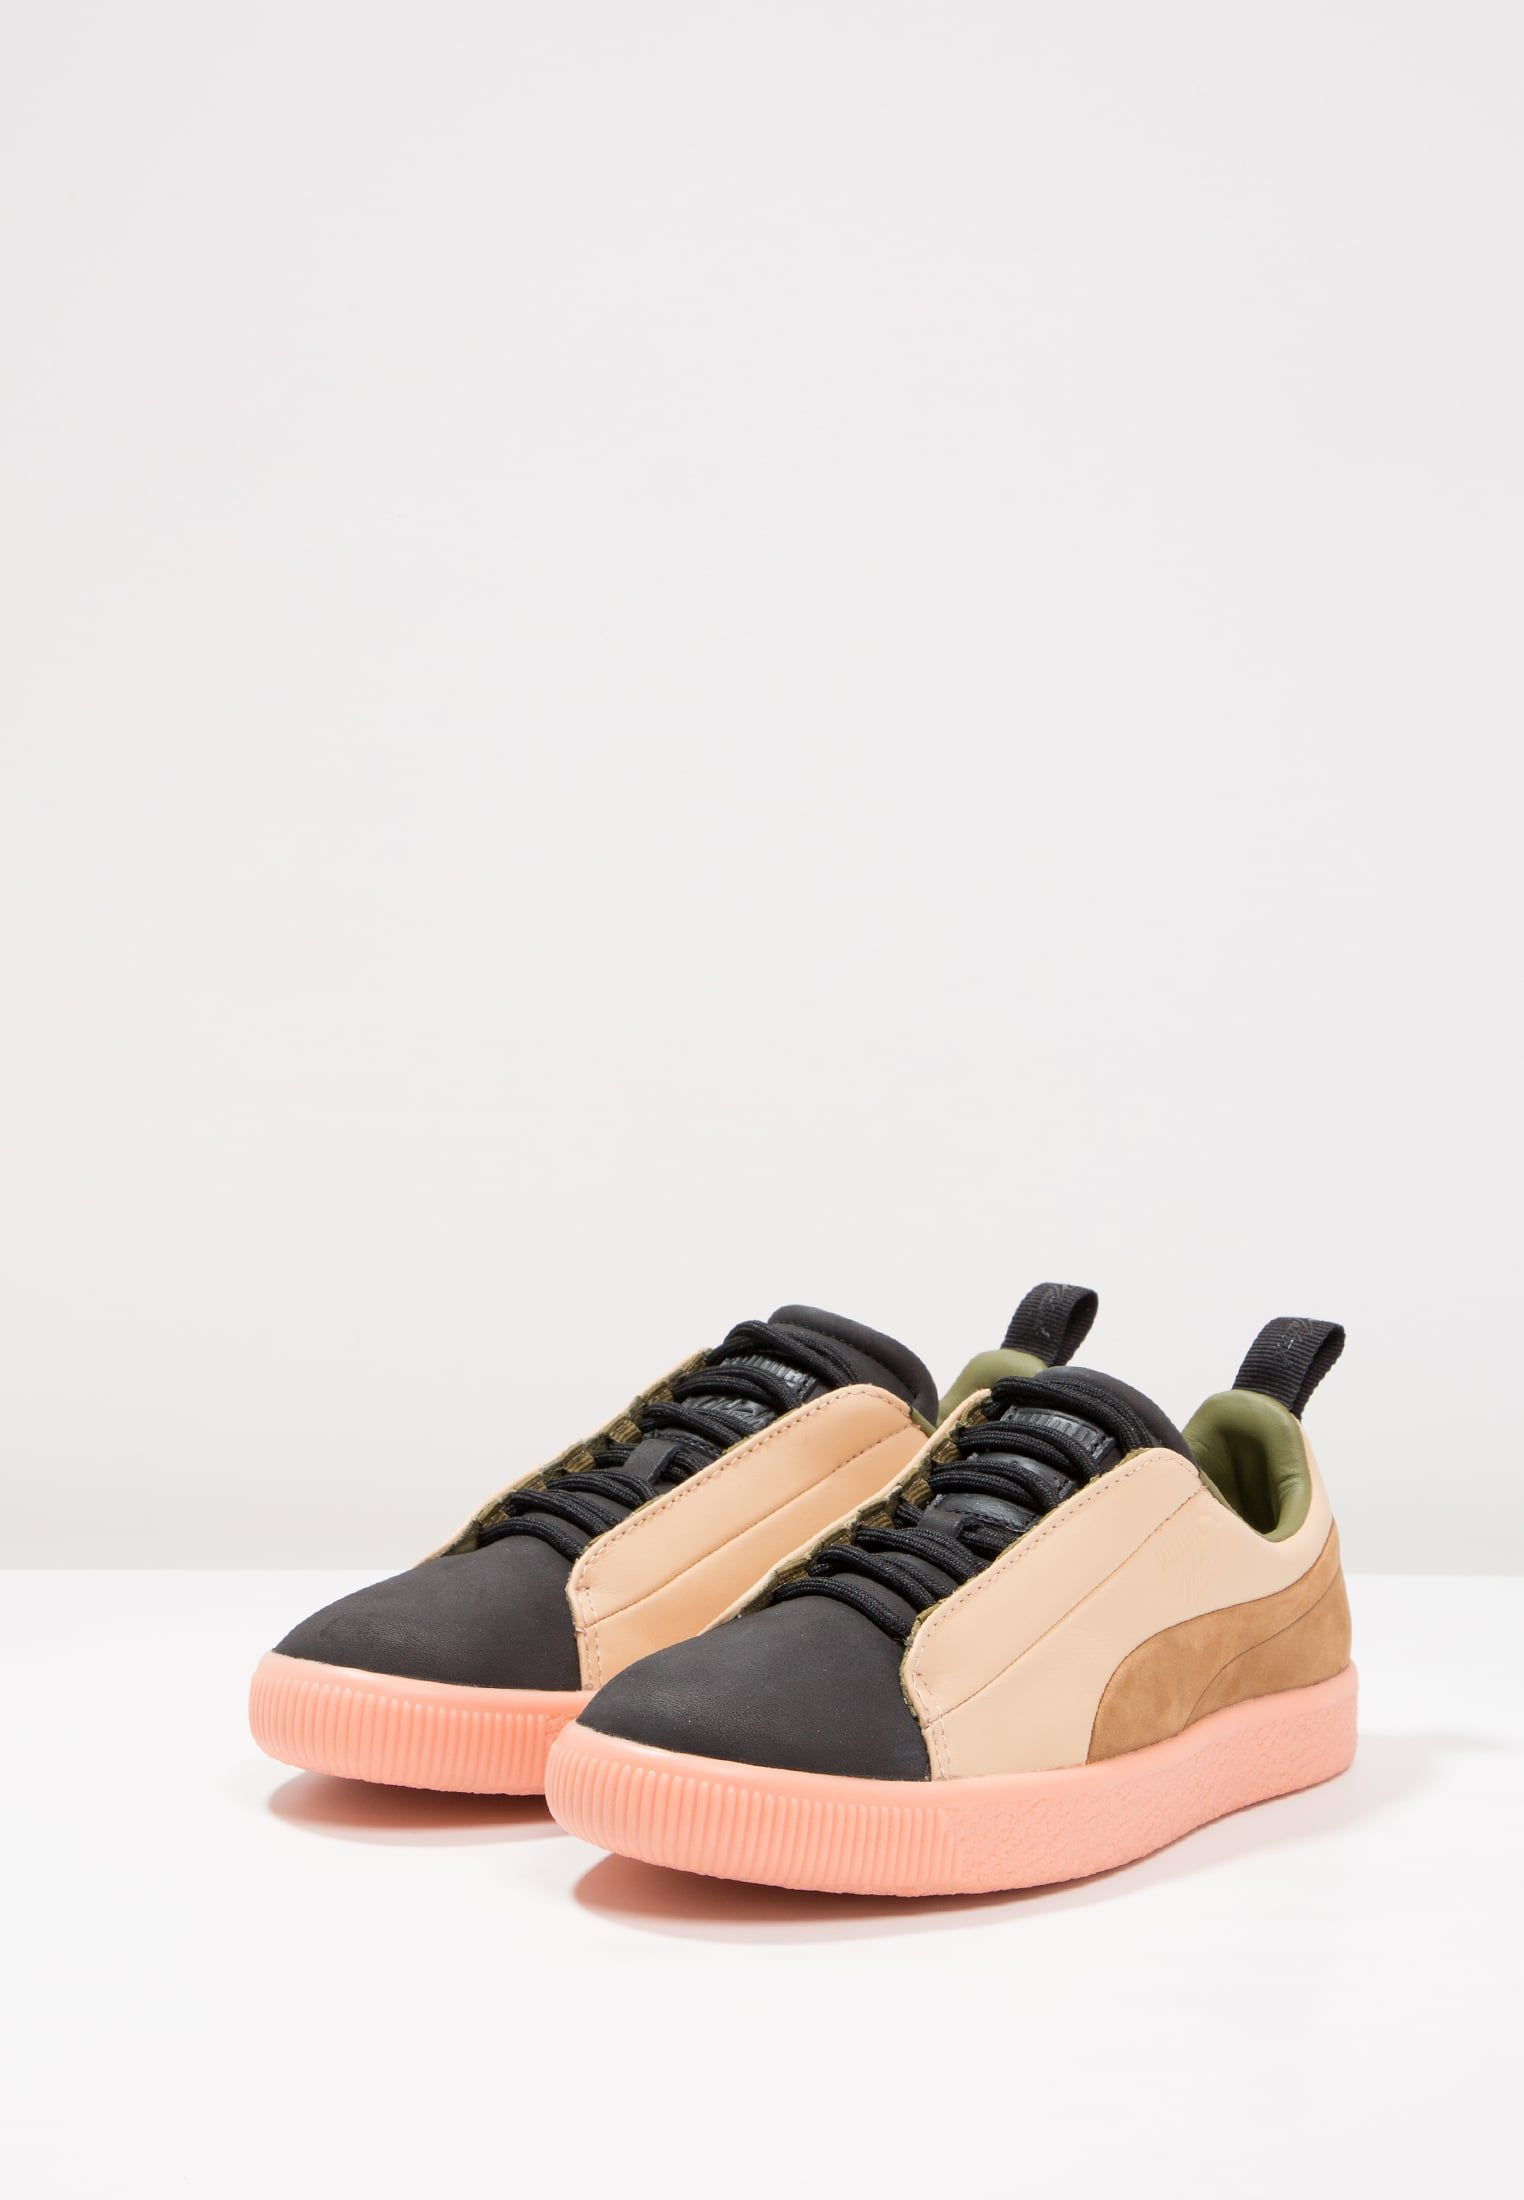 Jordan Online Shop | Jordan versandkostenfrei bei Zalando.at